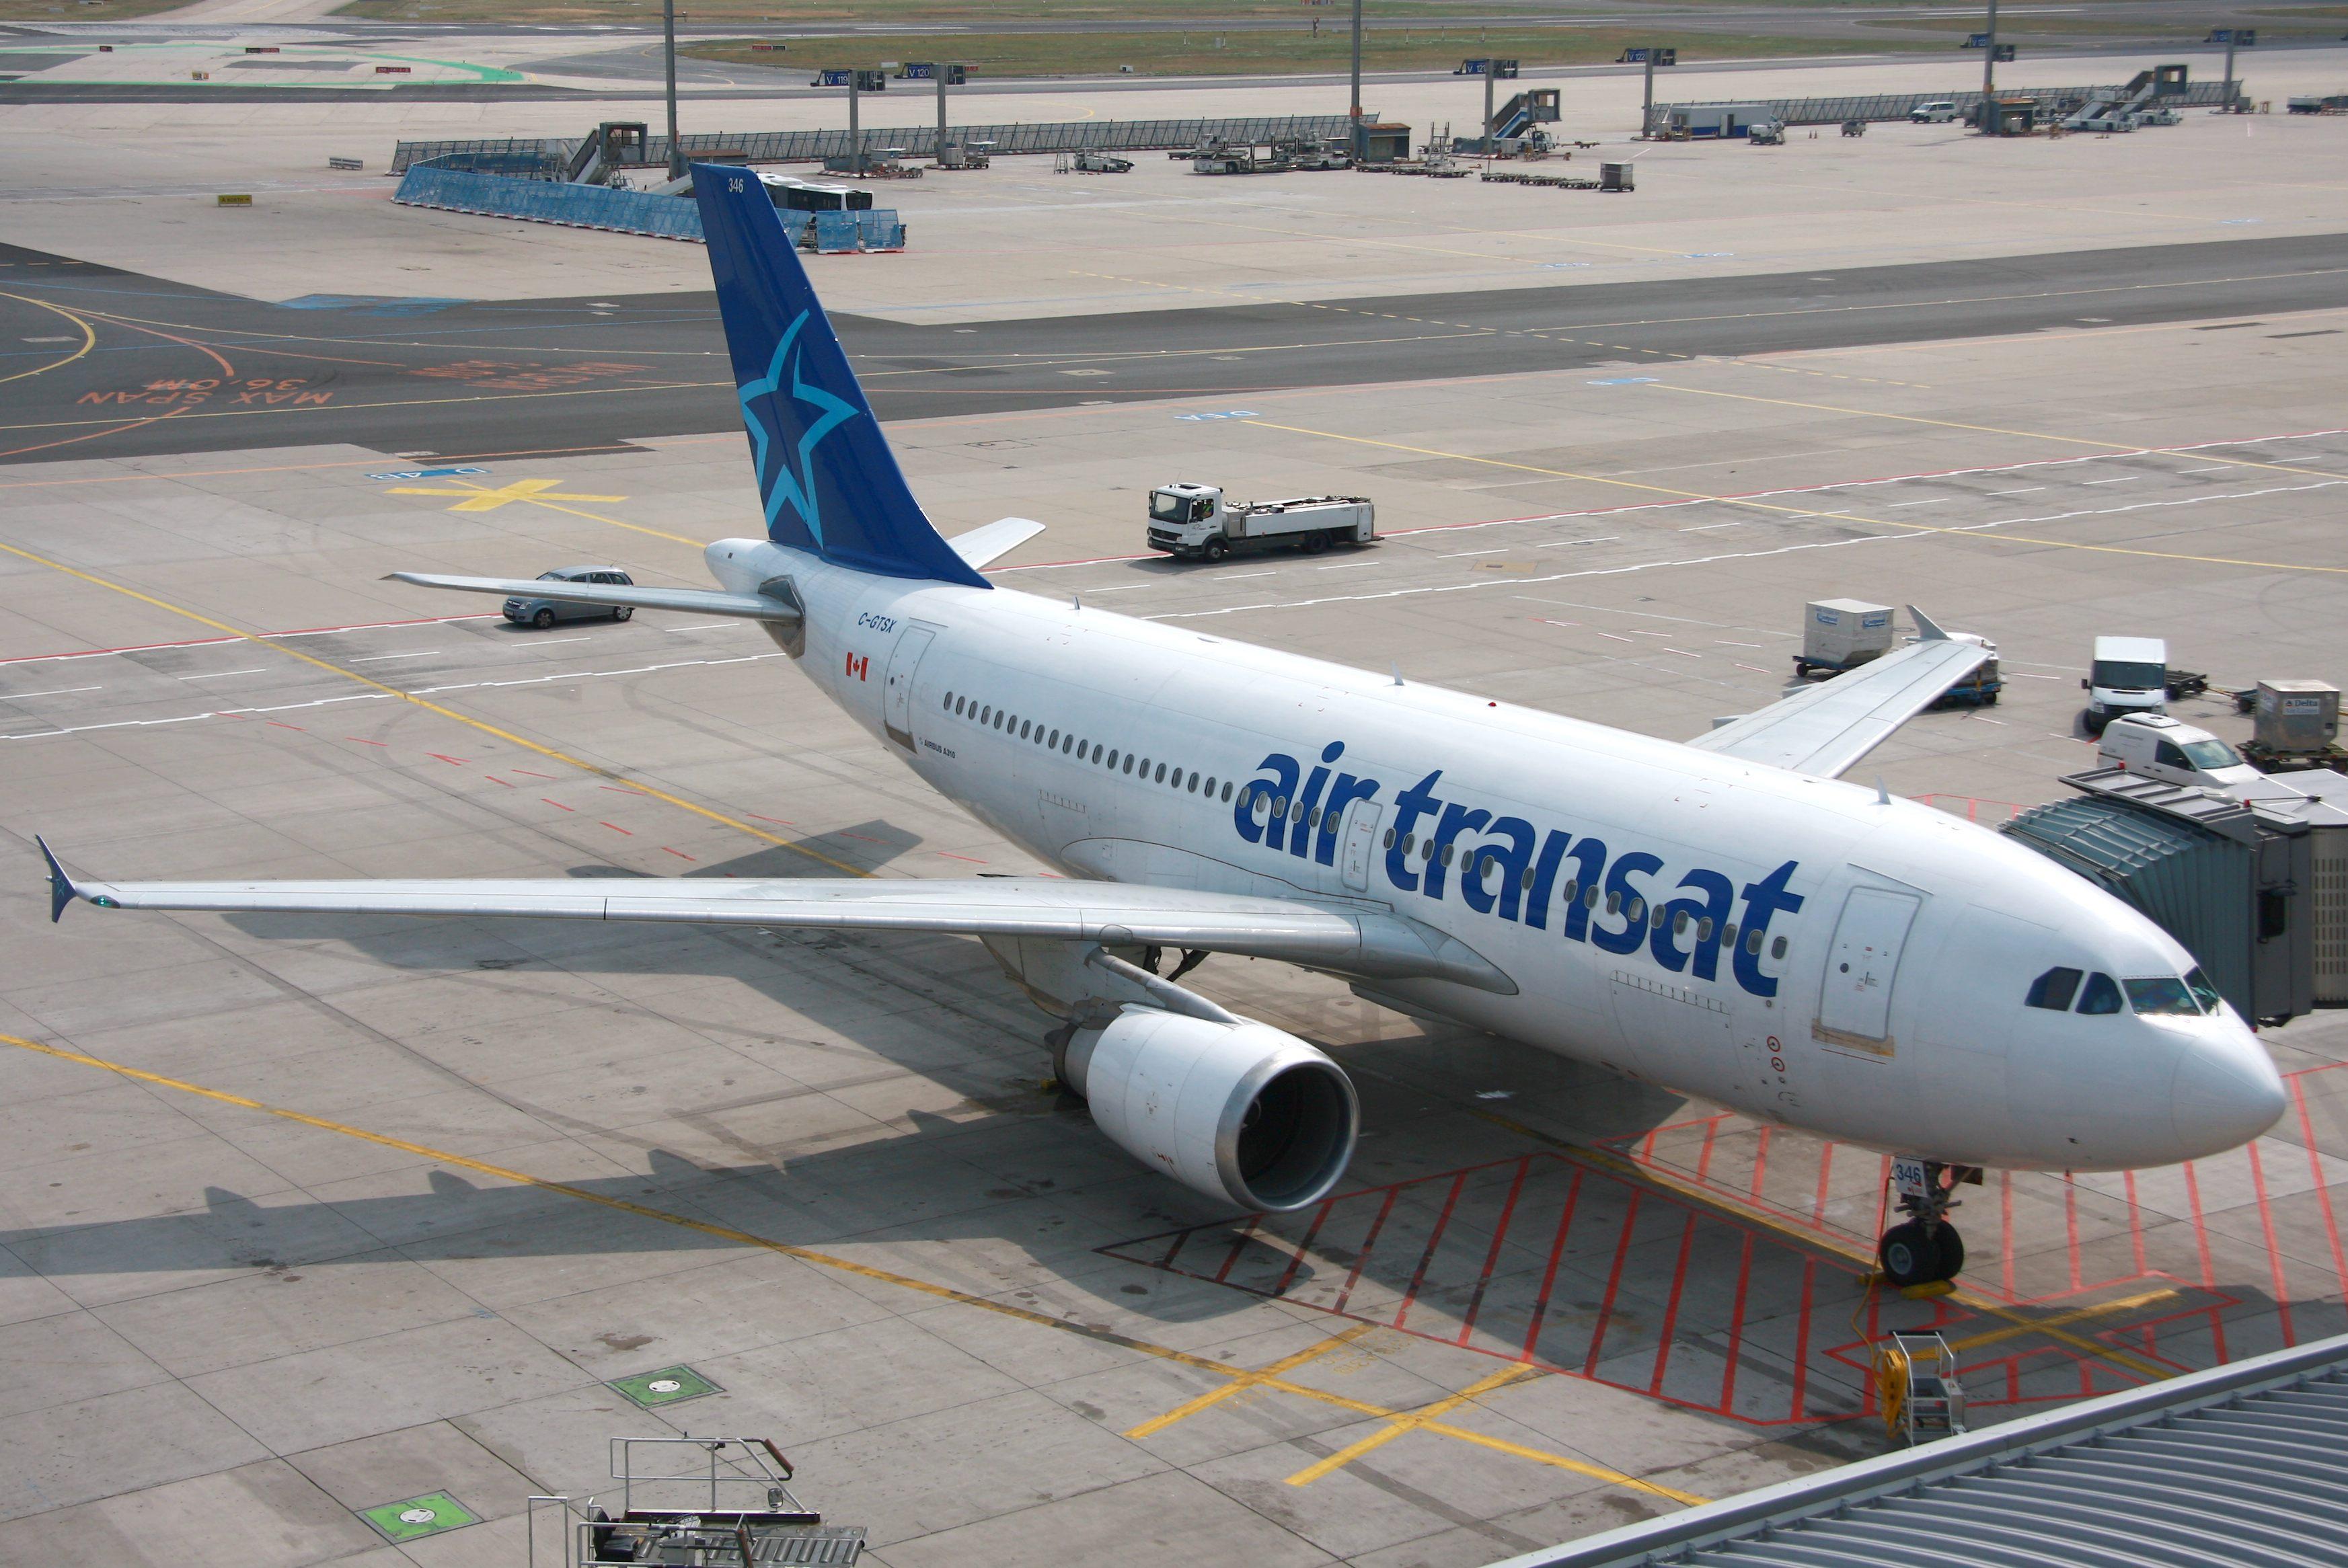 file a310 airtransat c gtsx eddf jpg